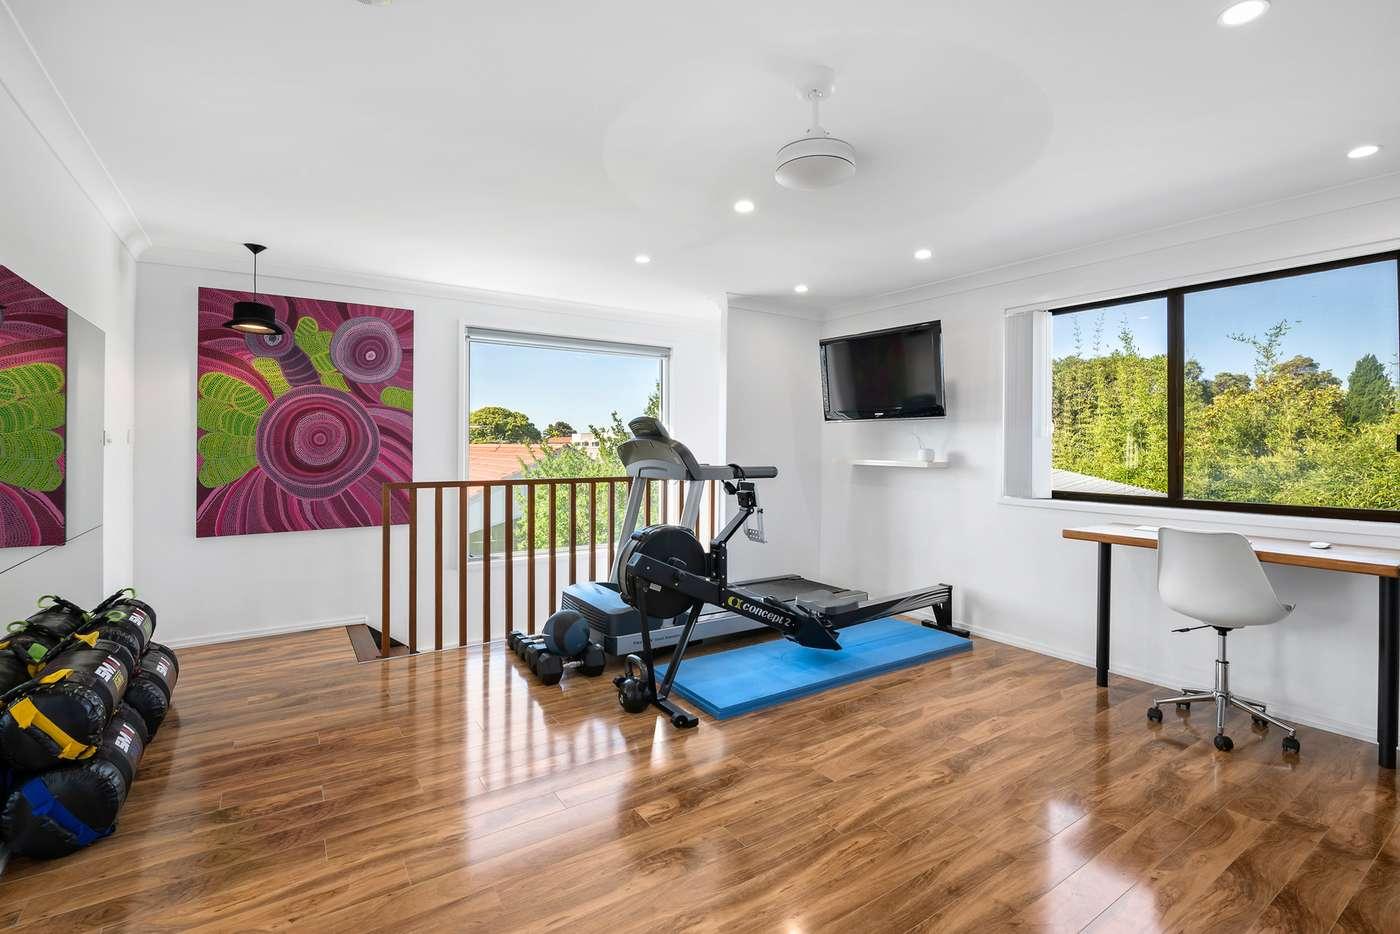 Sixth view of Homely house listing, 4 Gartfern Avenue, Wareemba NSW 2046